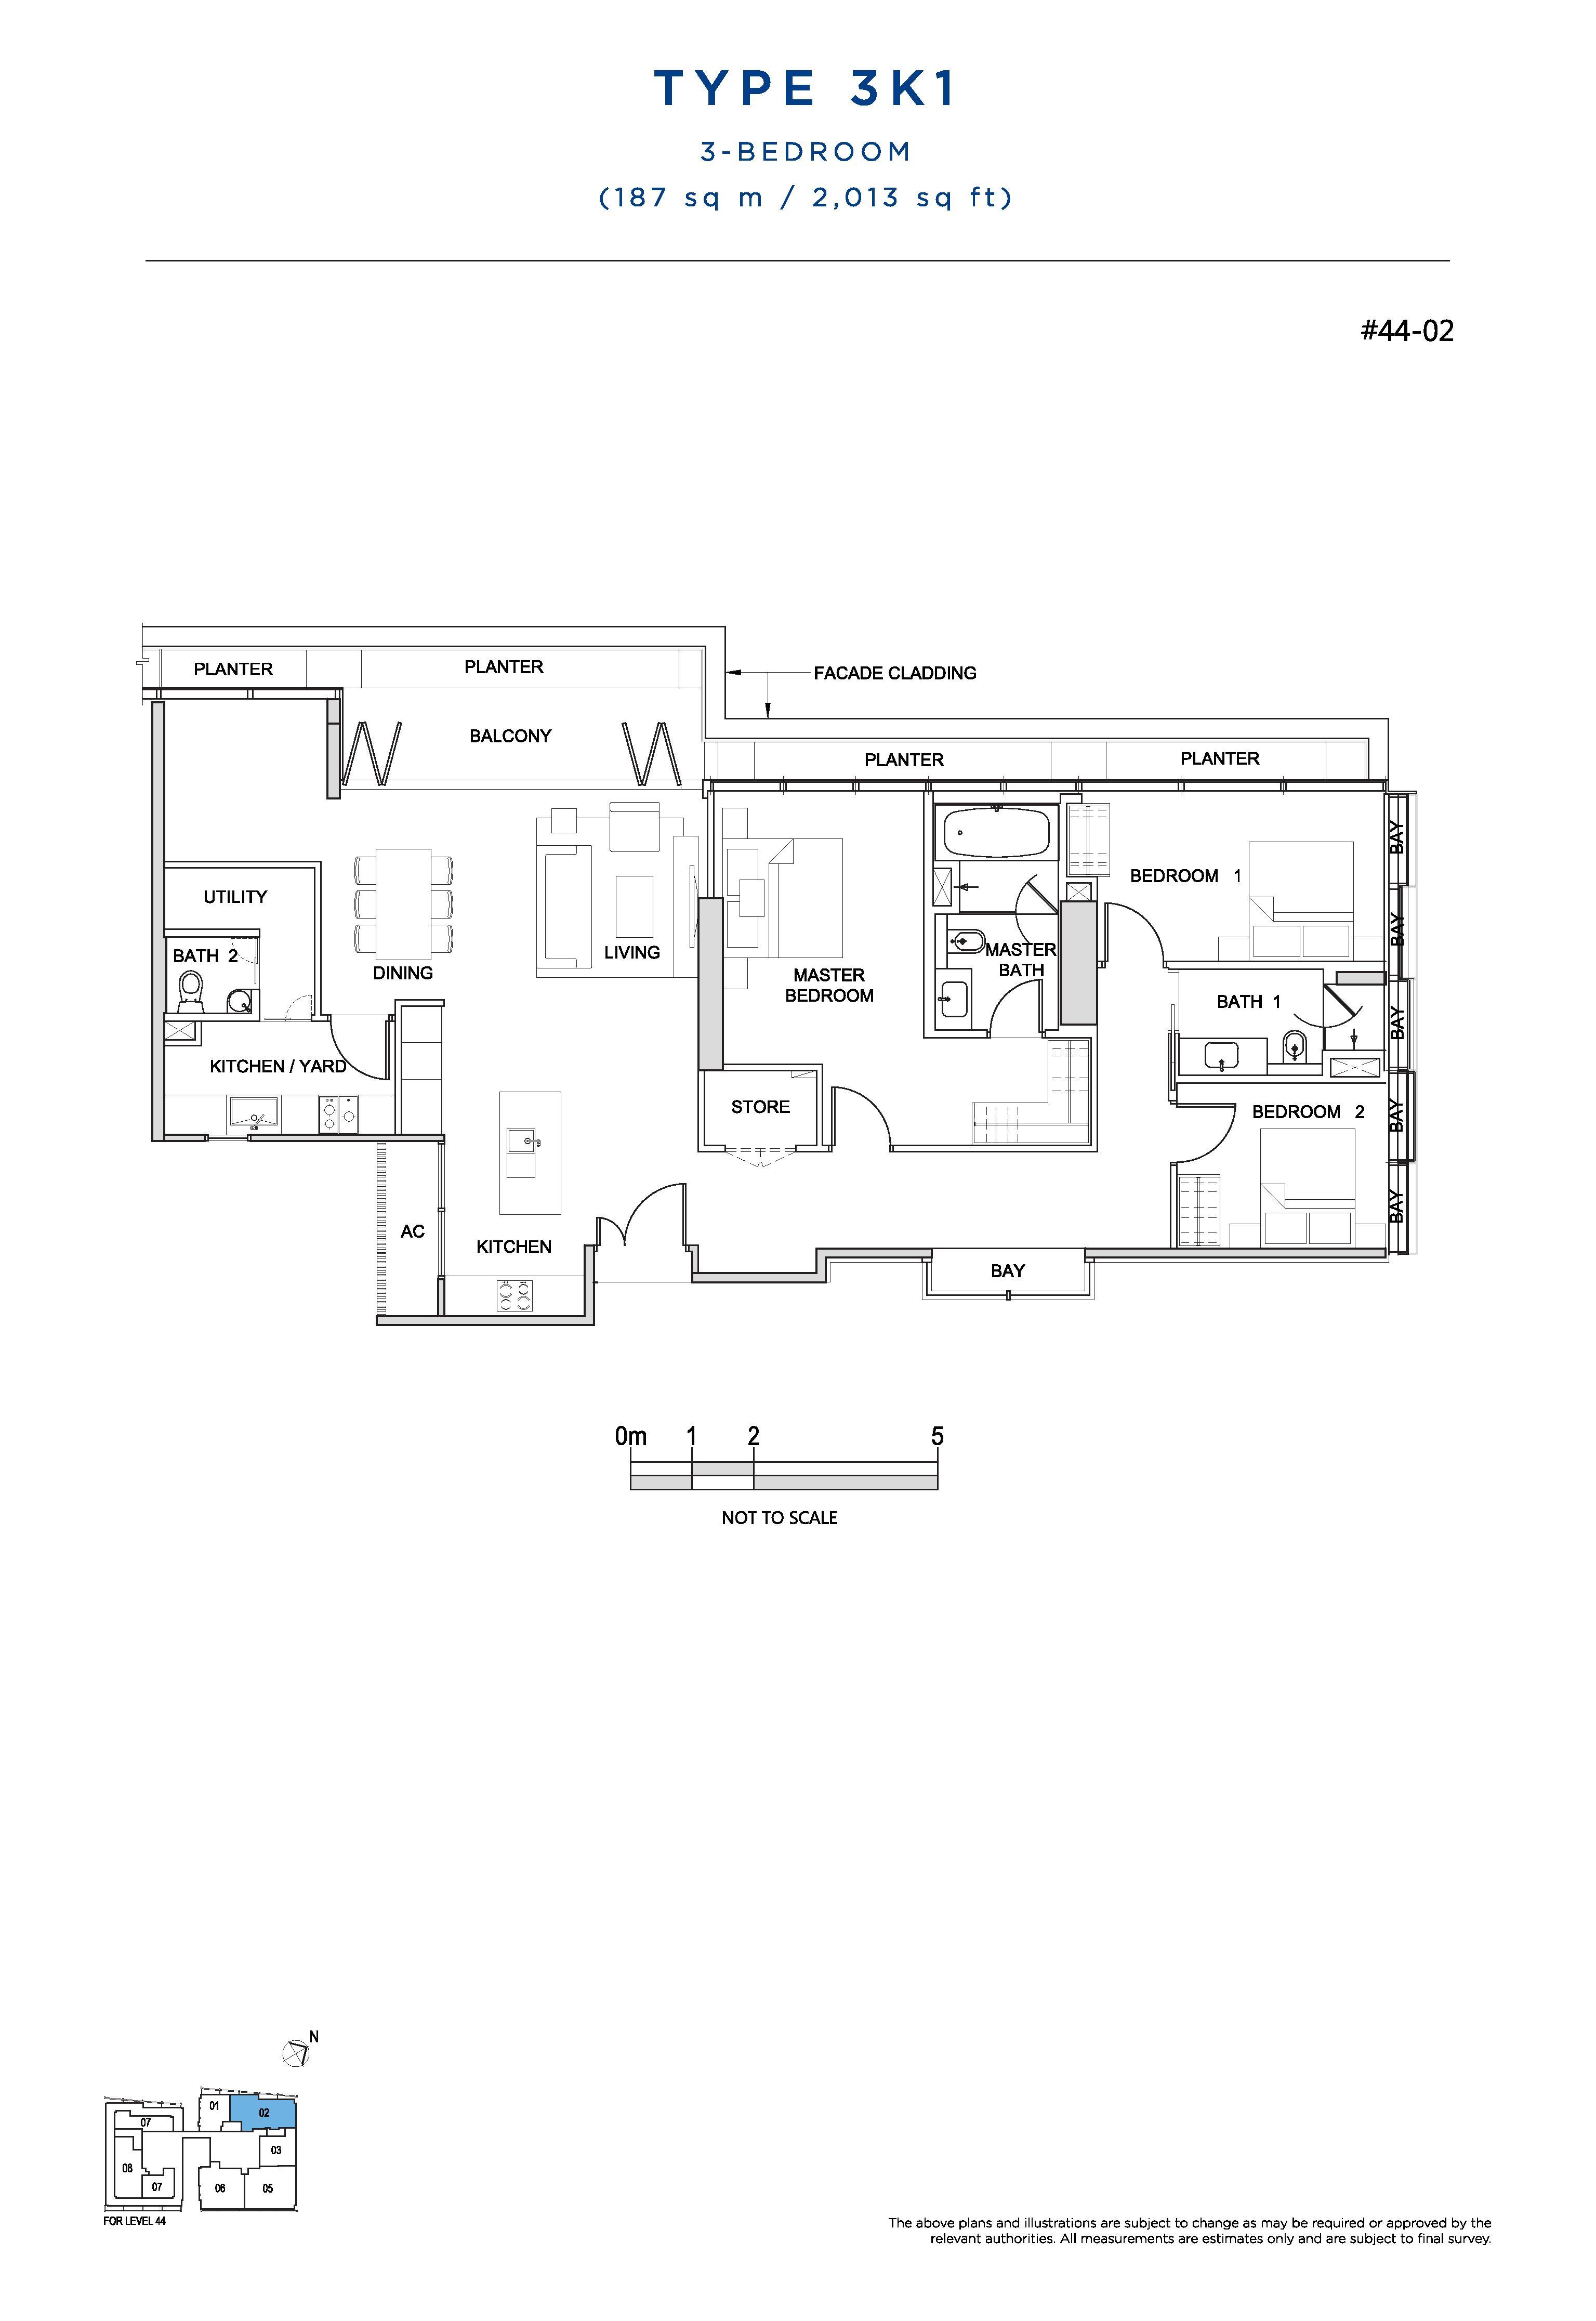 South Beach Residences 3 Bedroom Floor Plans Type 3K1